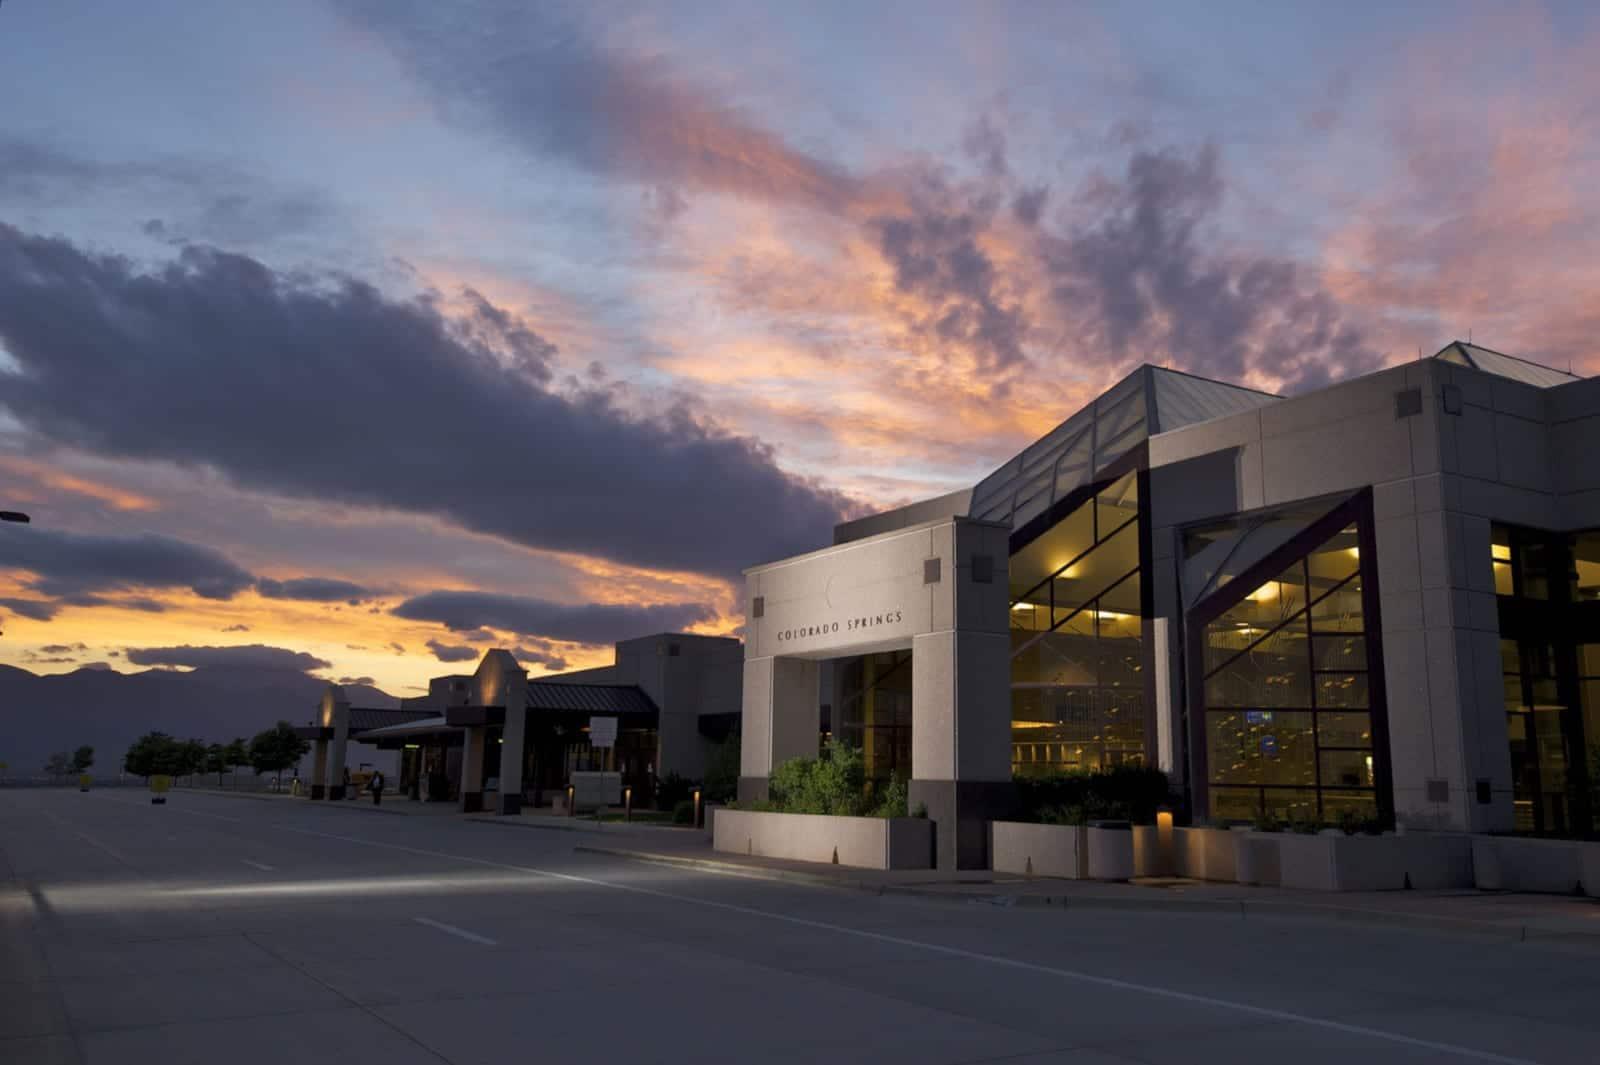 Colorado Springs Airport Terminal Dusk